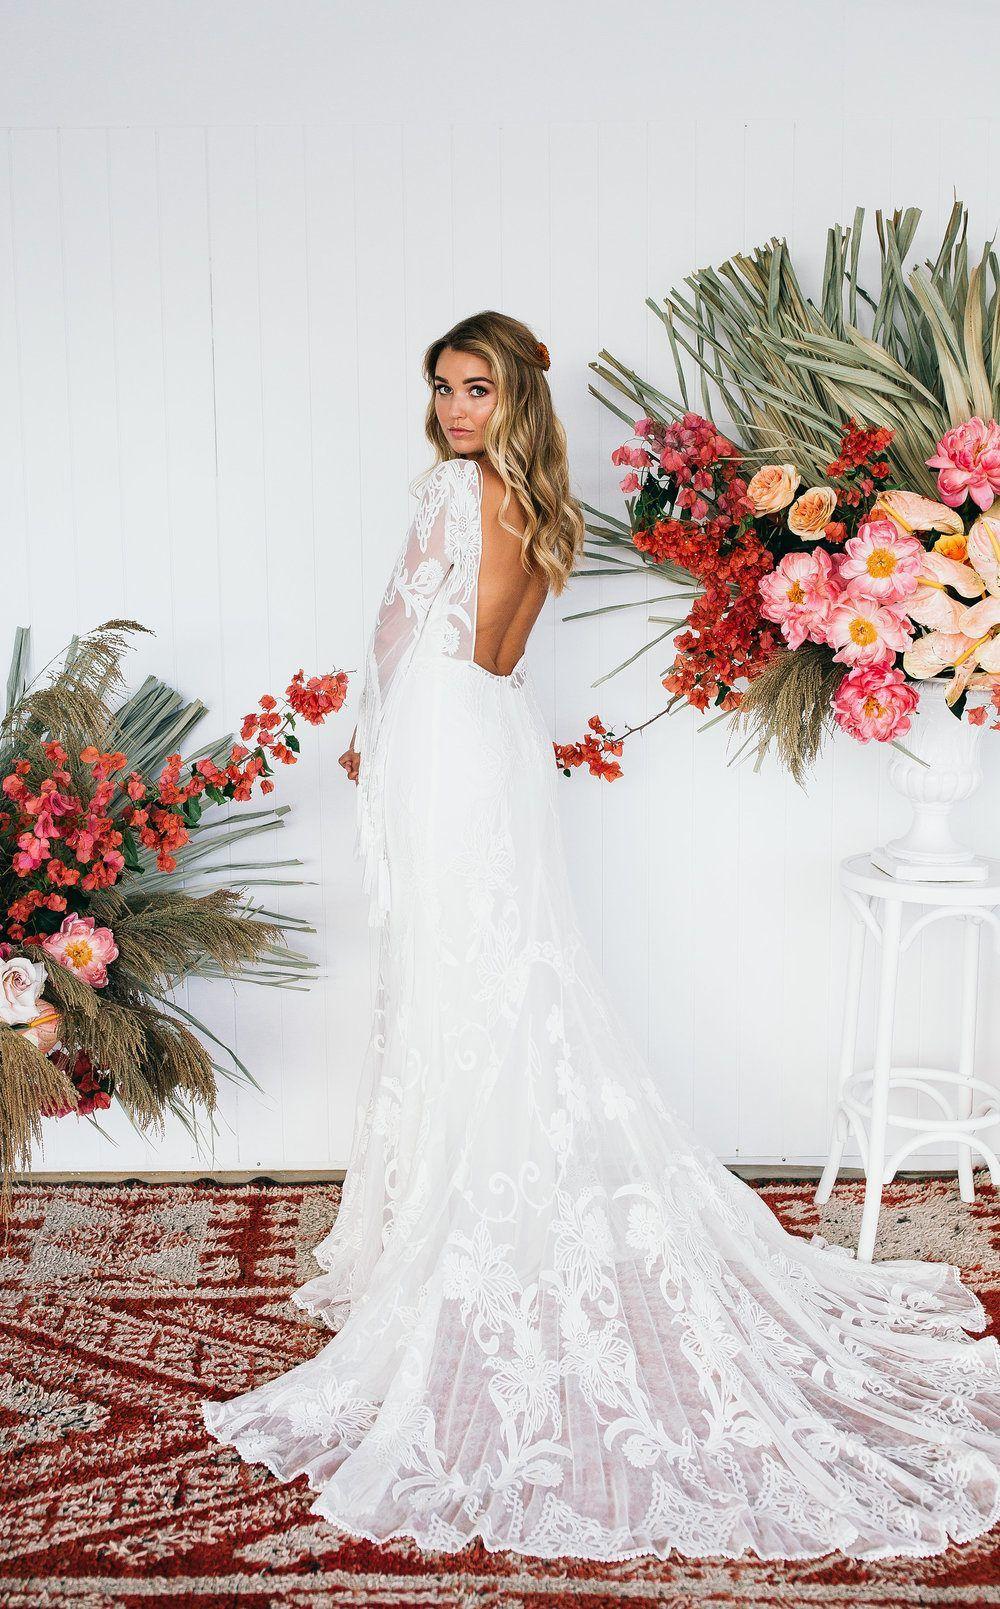 Beach Wedding Editorial with Dried Florals and Papaya Wedding